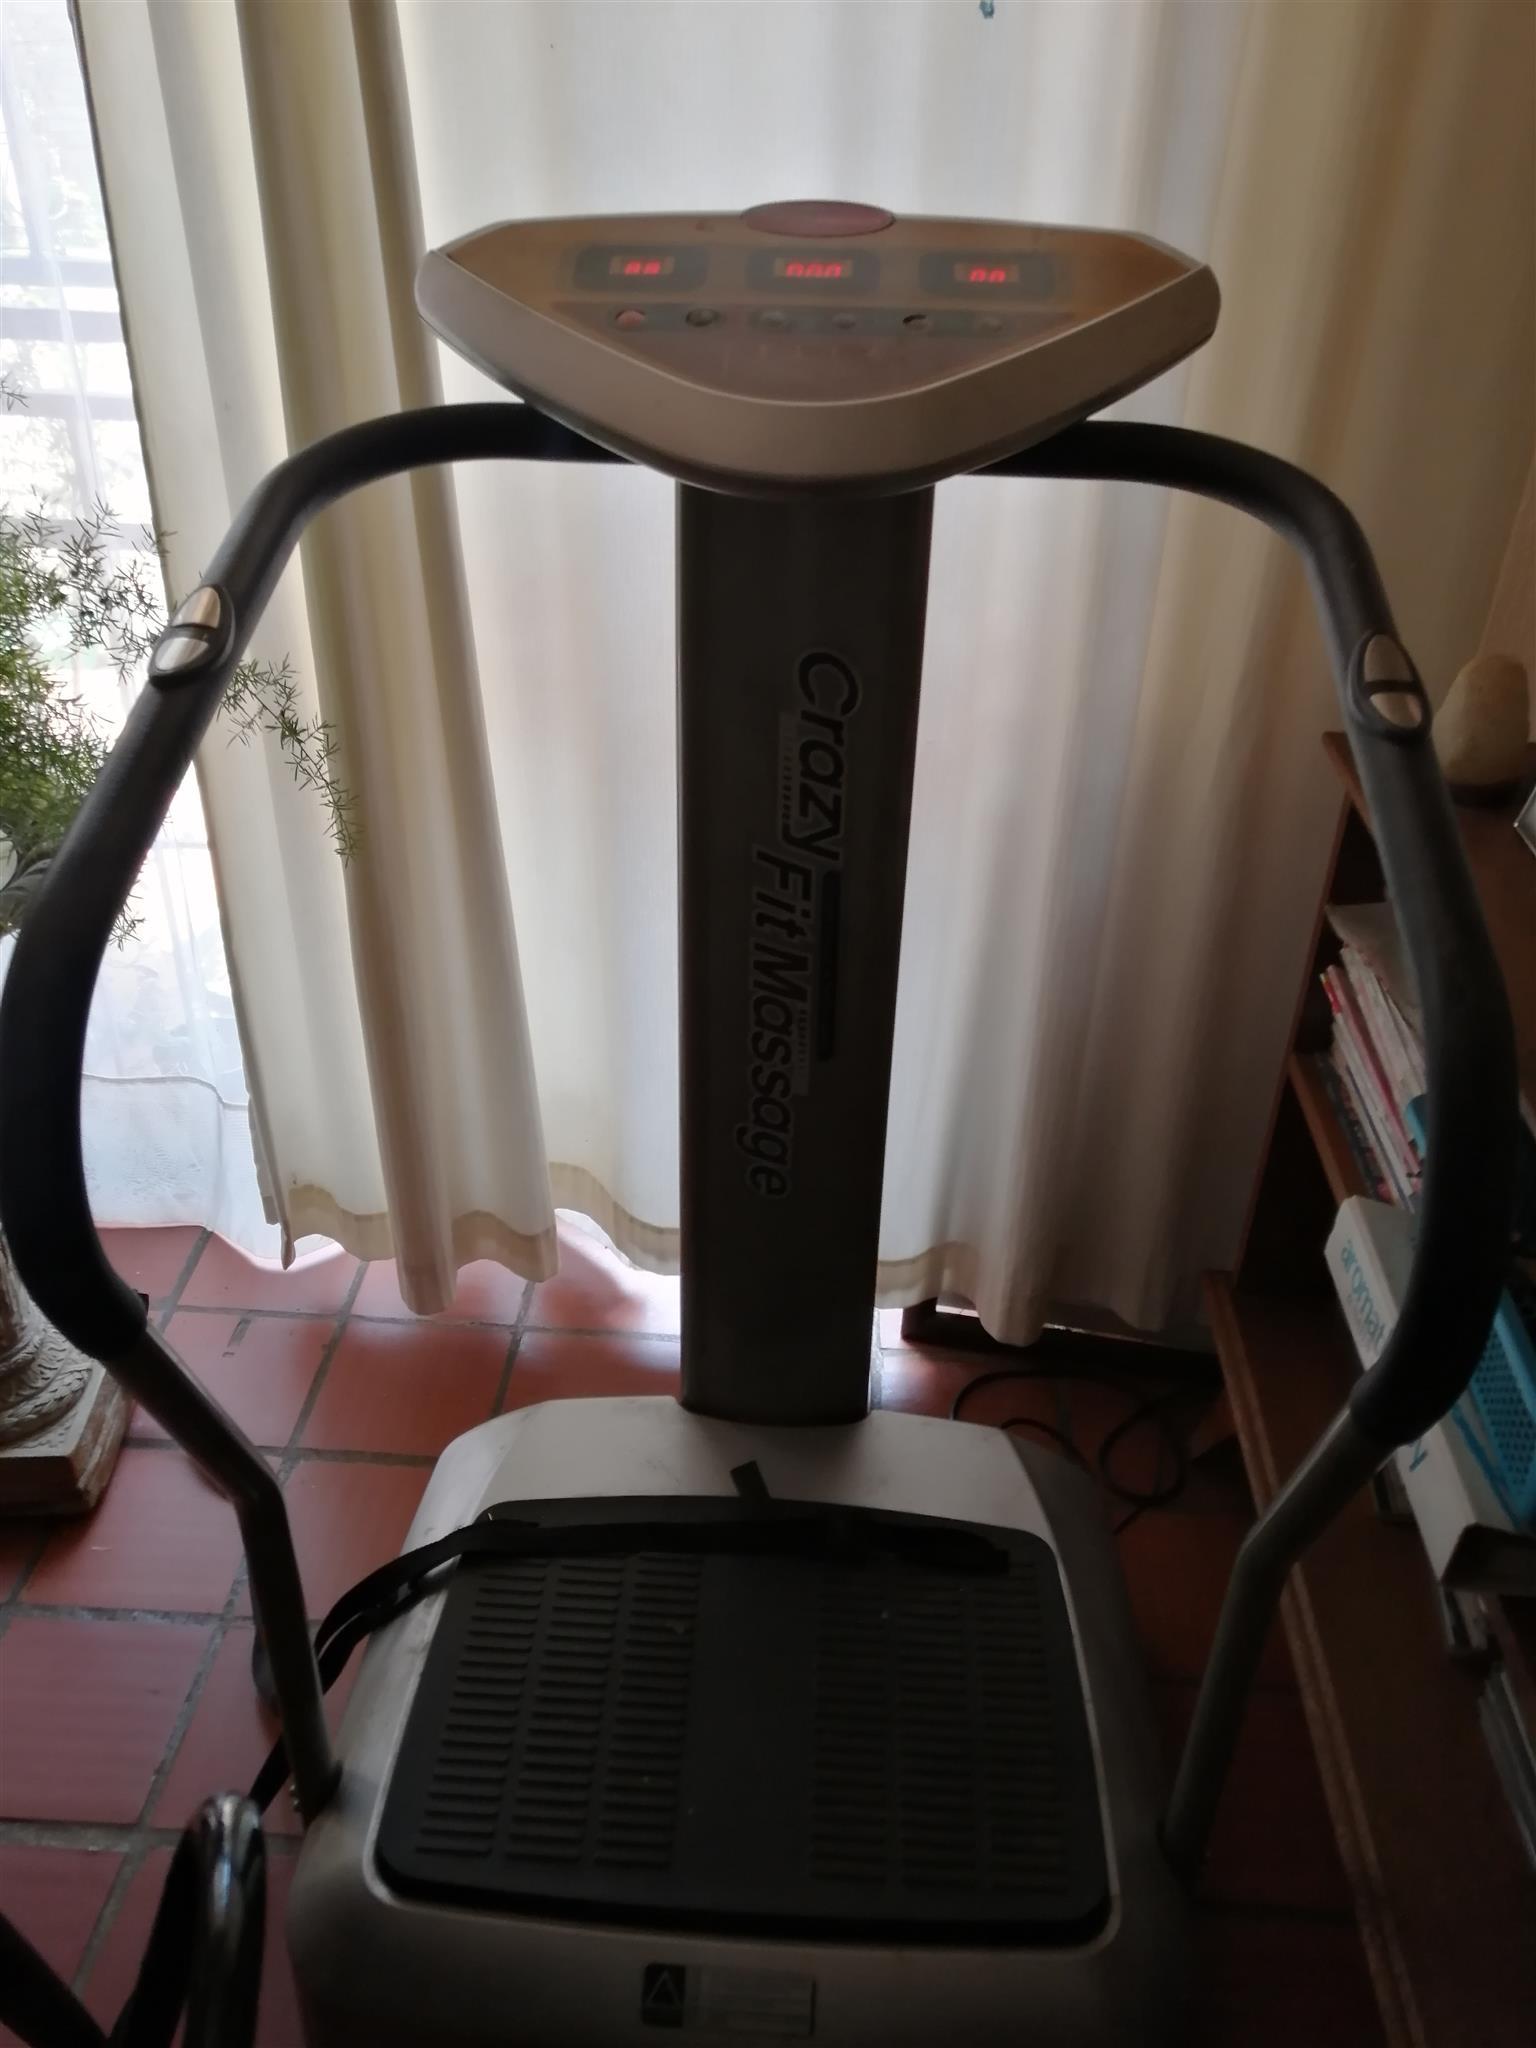 Crazy fit machine